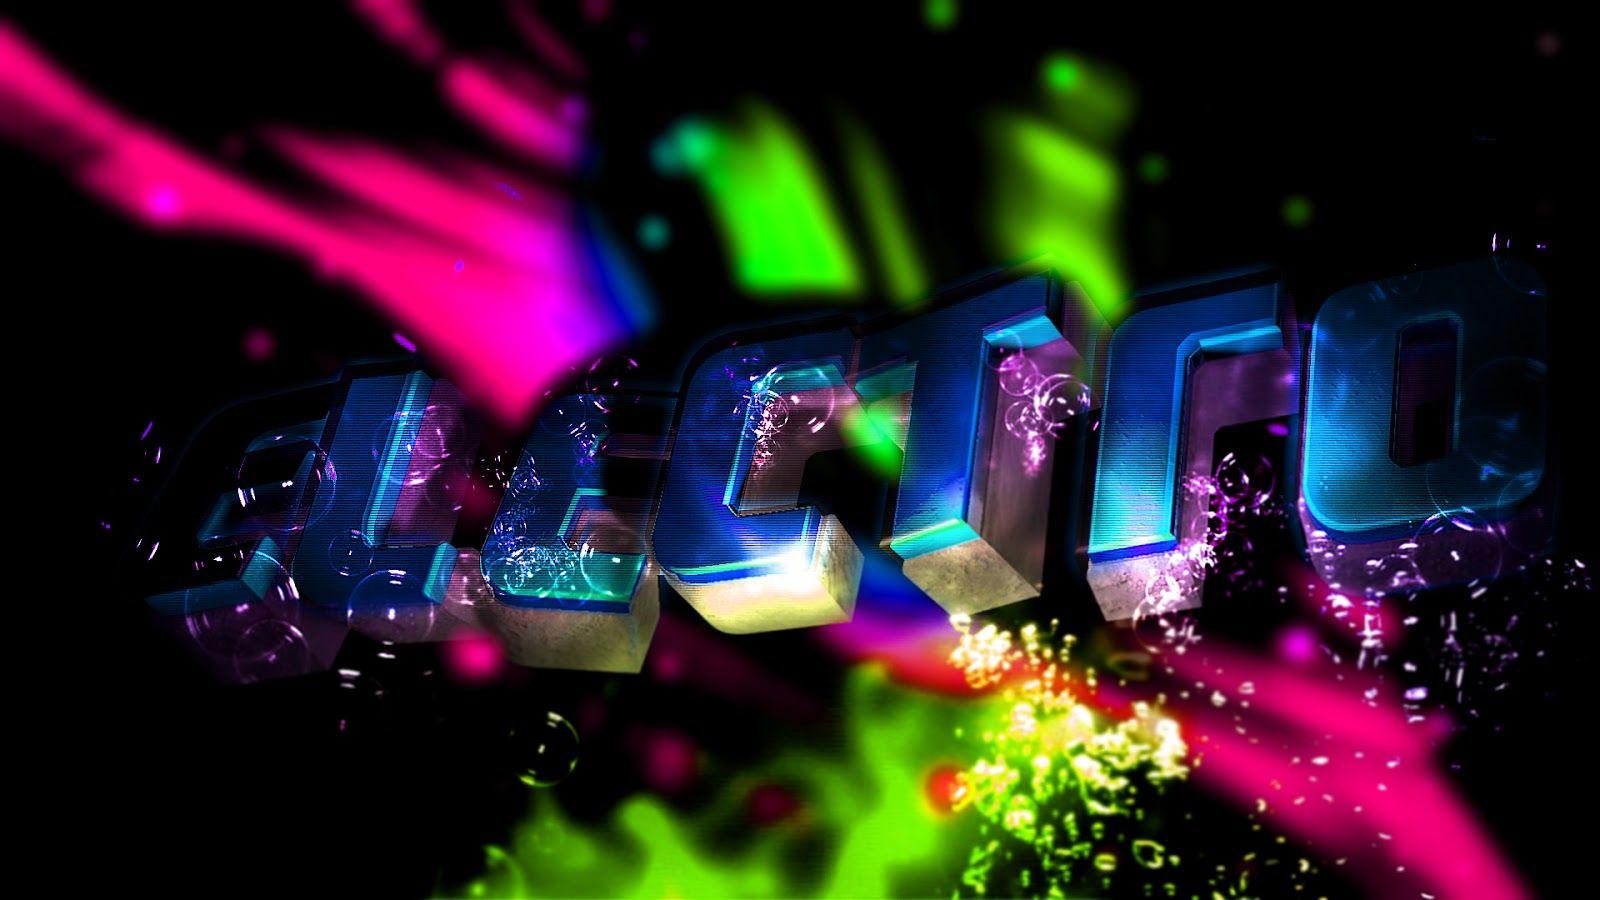 Linehood design electro h tt rk p hd 1920x1080 for House music finder